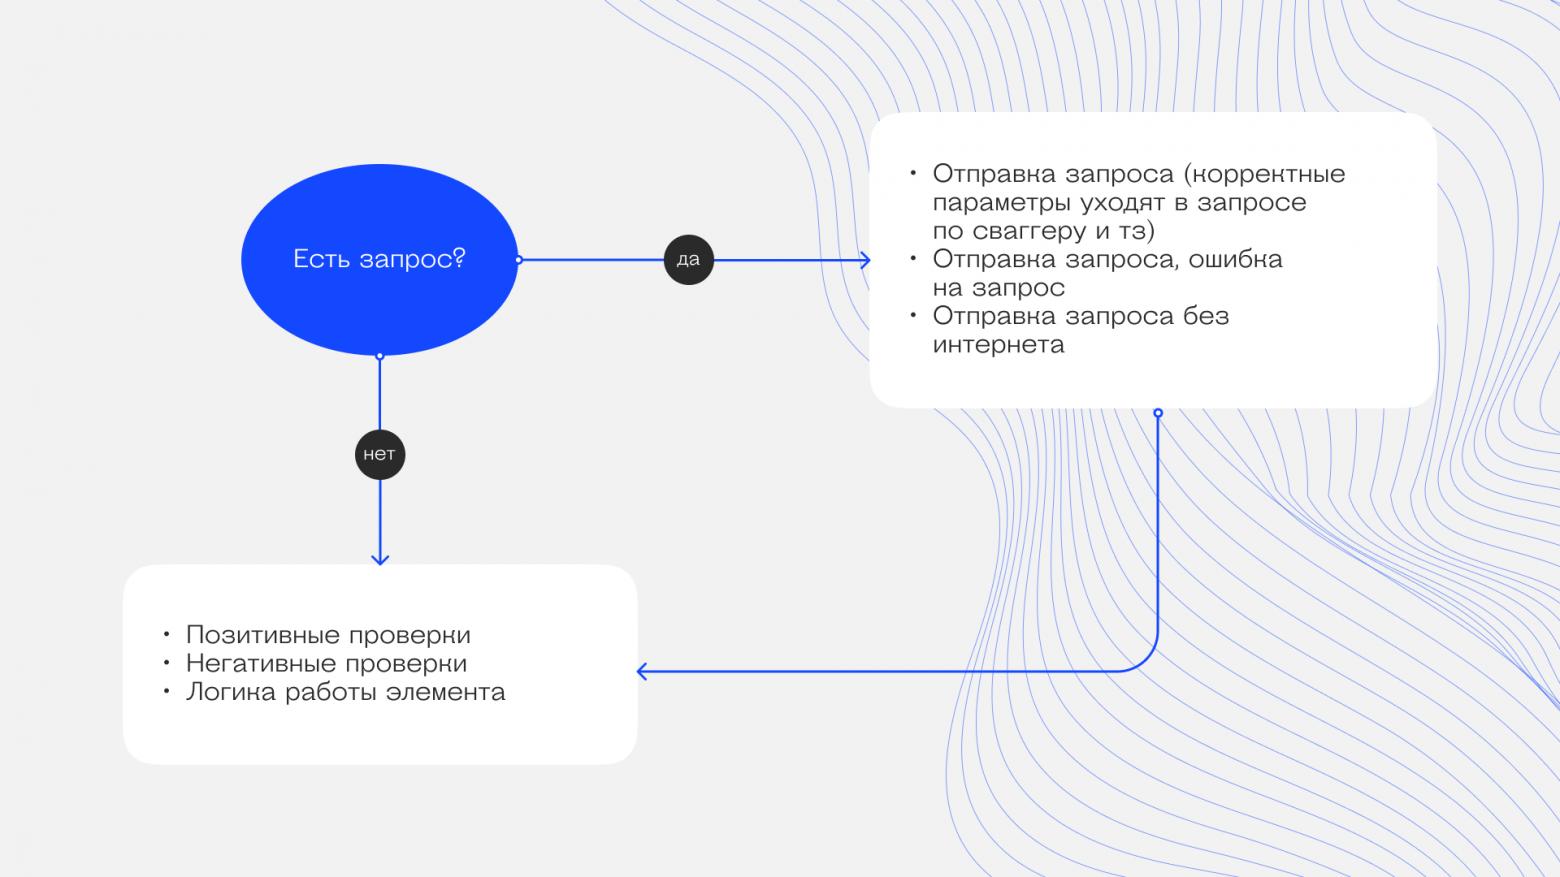 Визуализация написания проверок по элементу